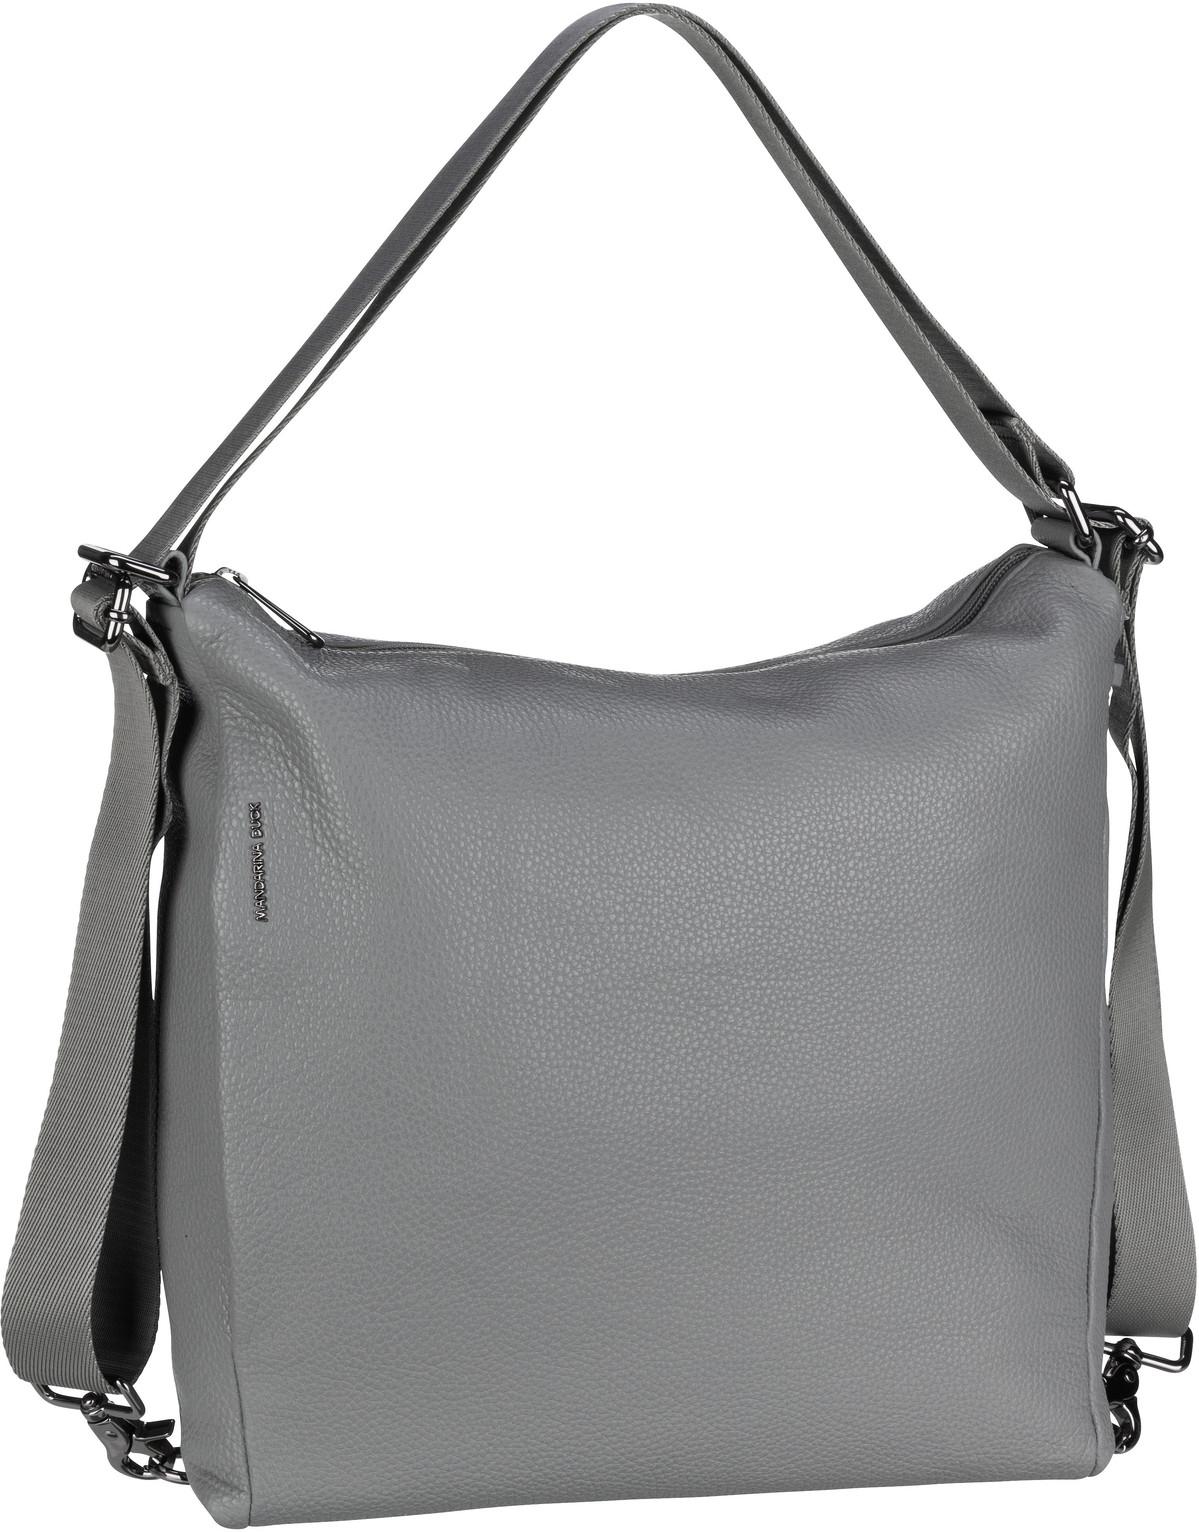 Handtasche Mellow Leather Hobo Backpack FZT72 Aluminium